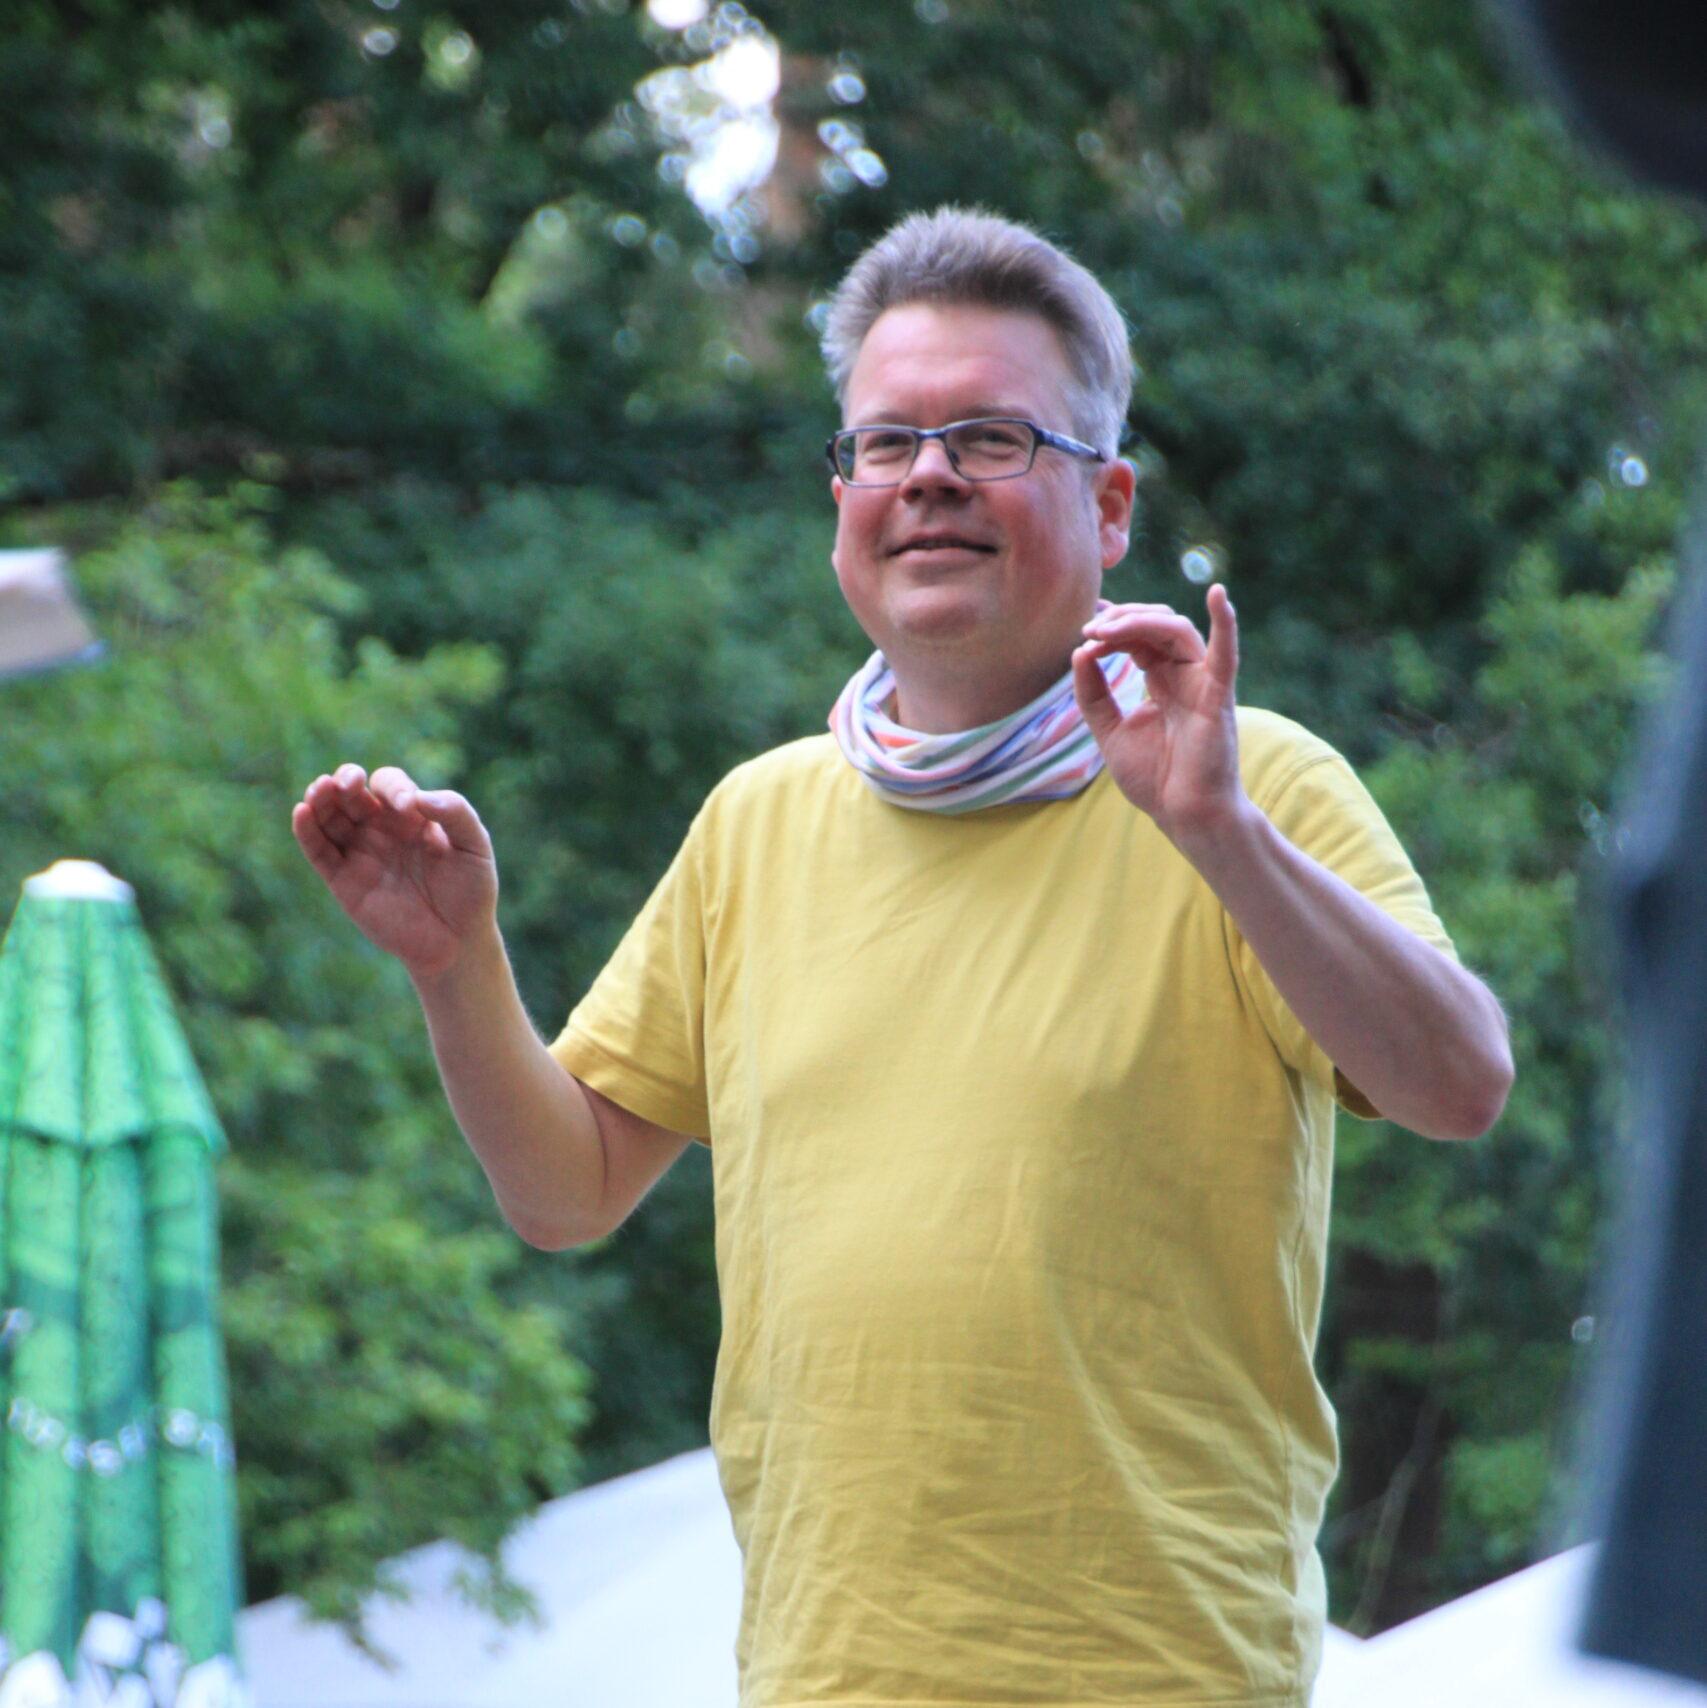 Chorleiter Martin Helge Lüssenhop